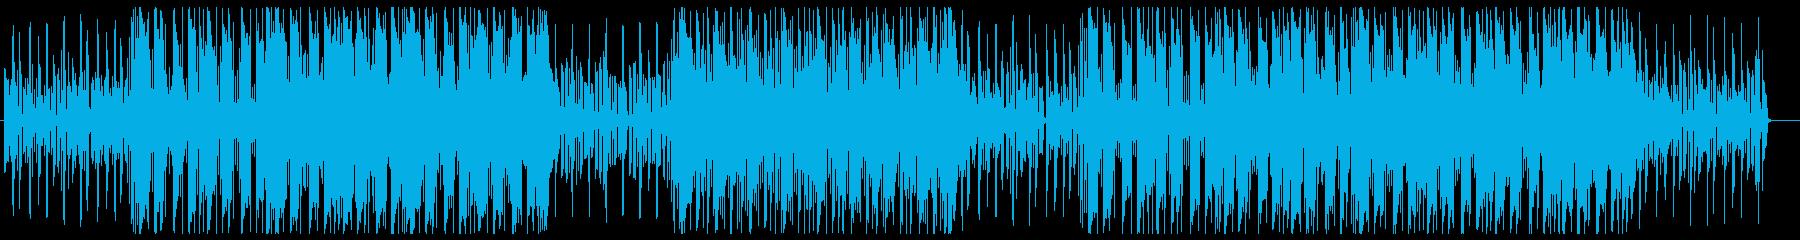 Cute future pop's reproduced waveform